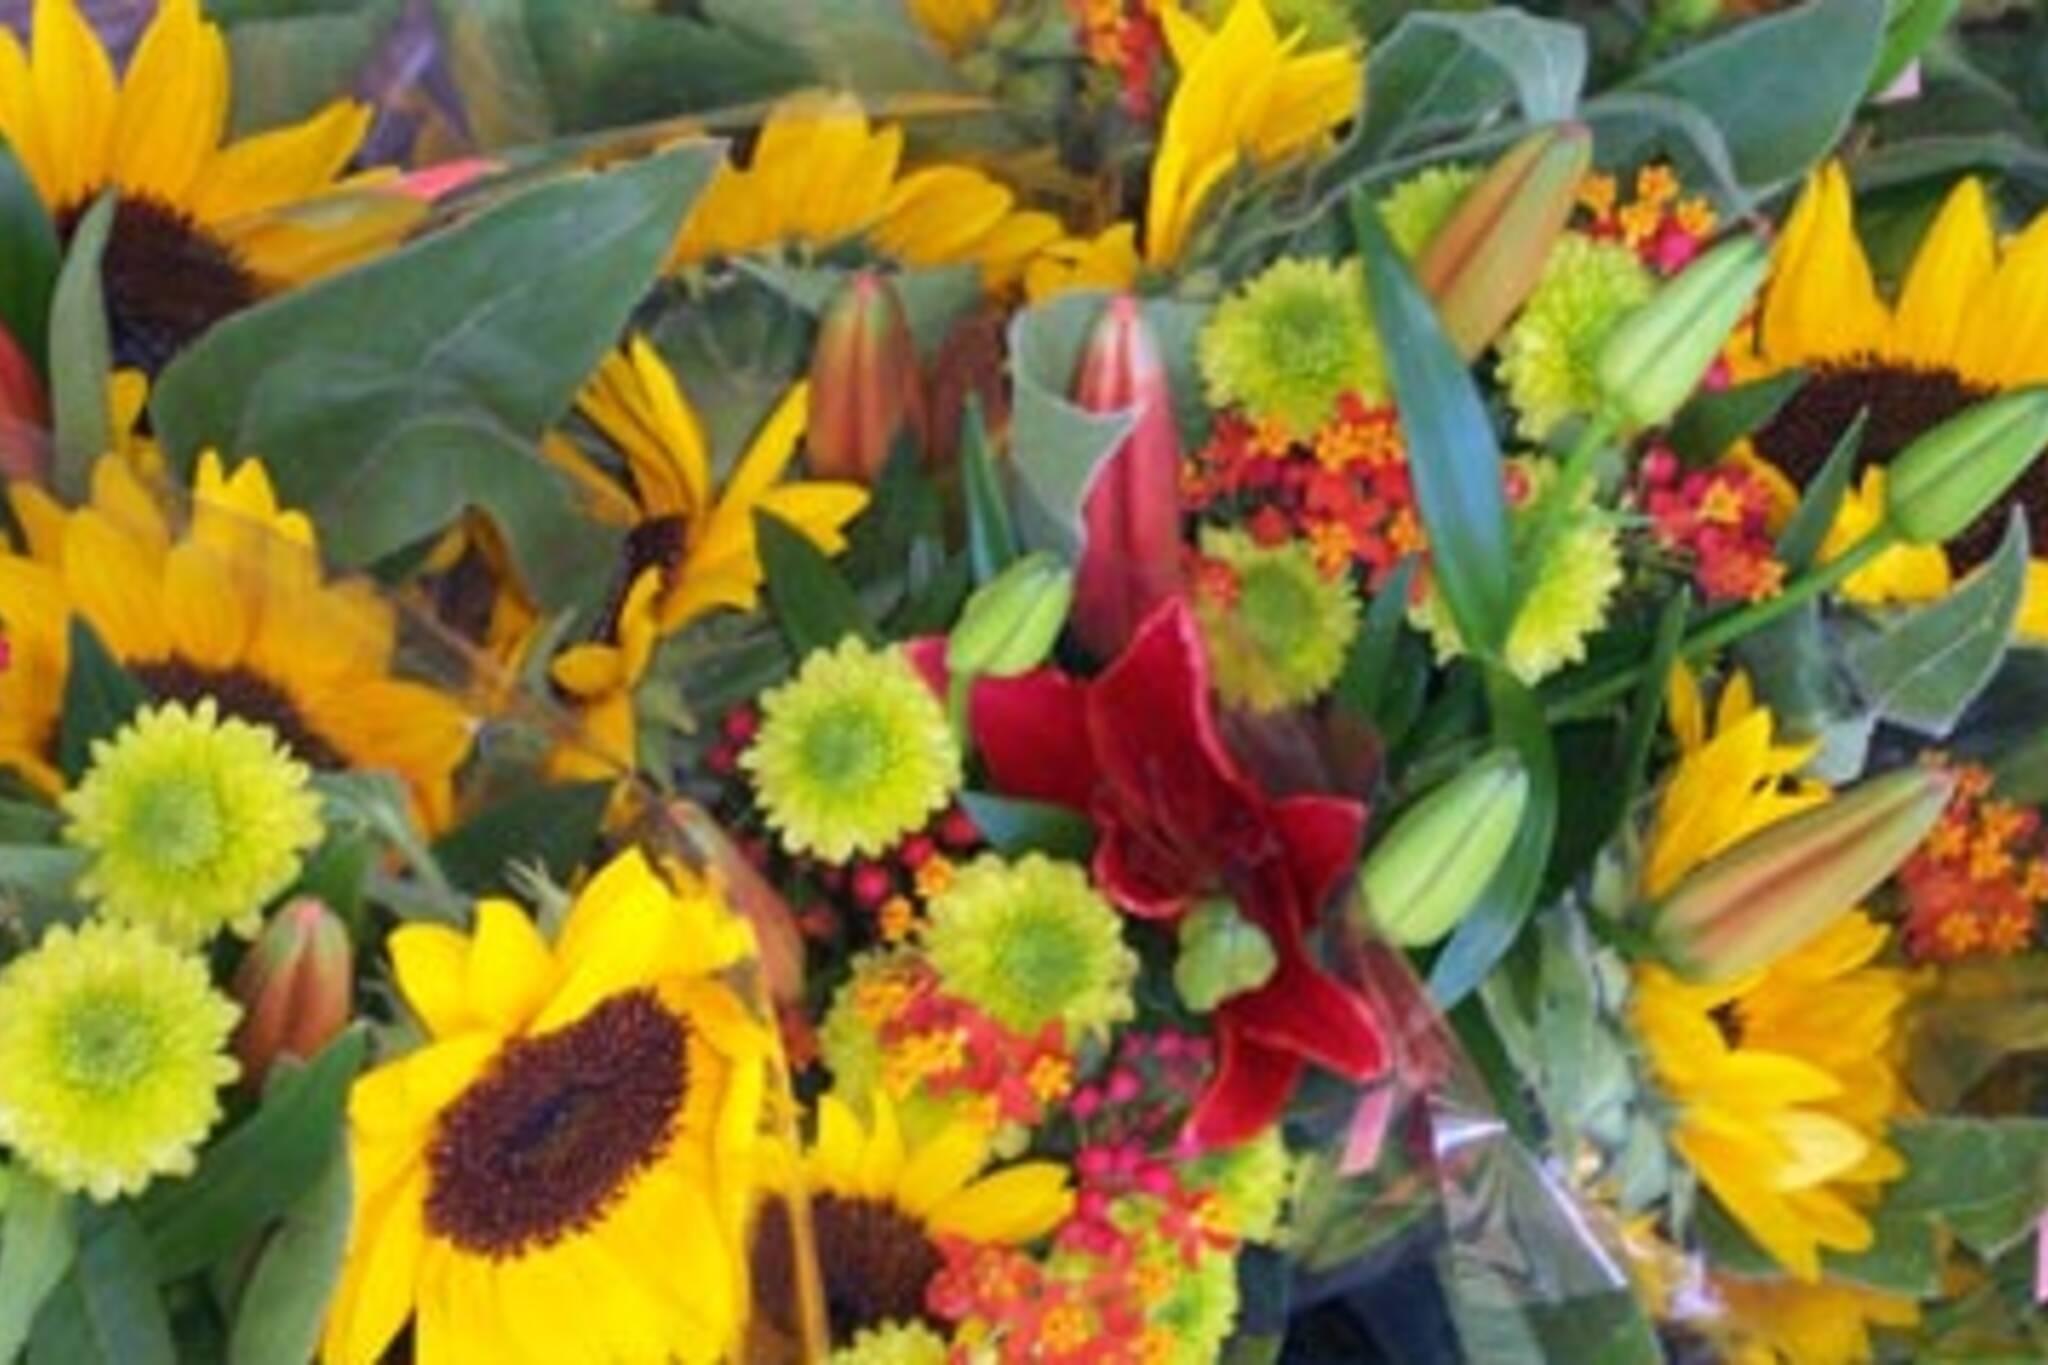 flowersnew.jpg